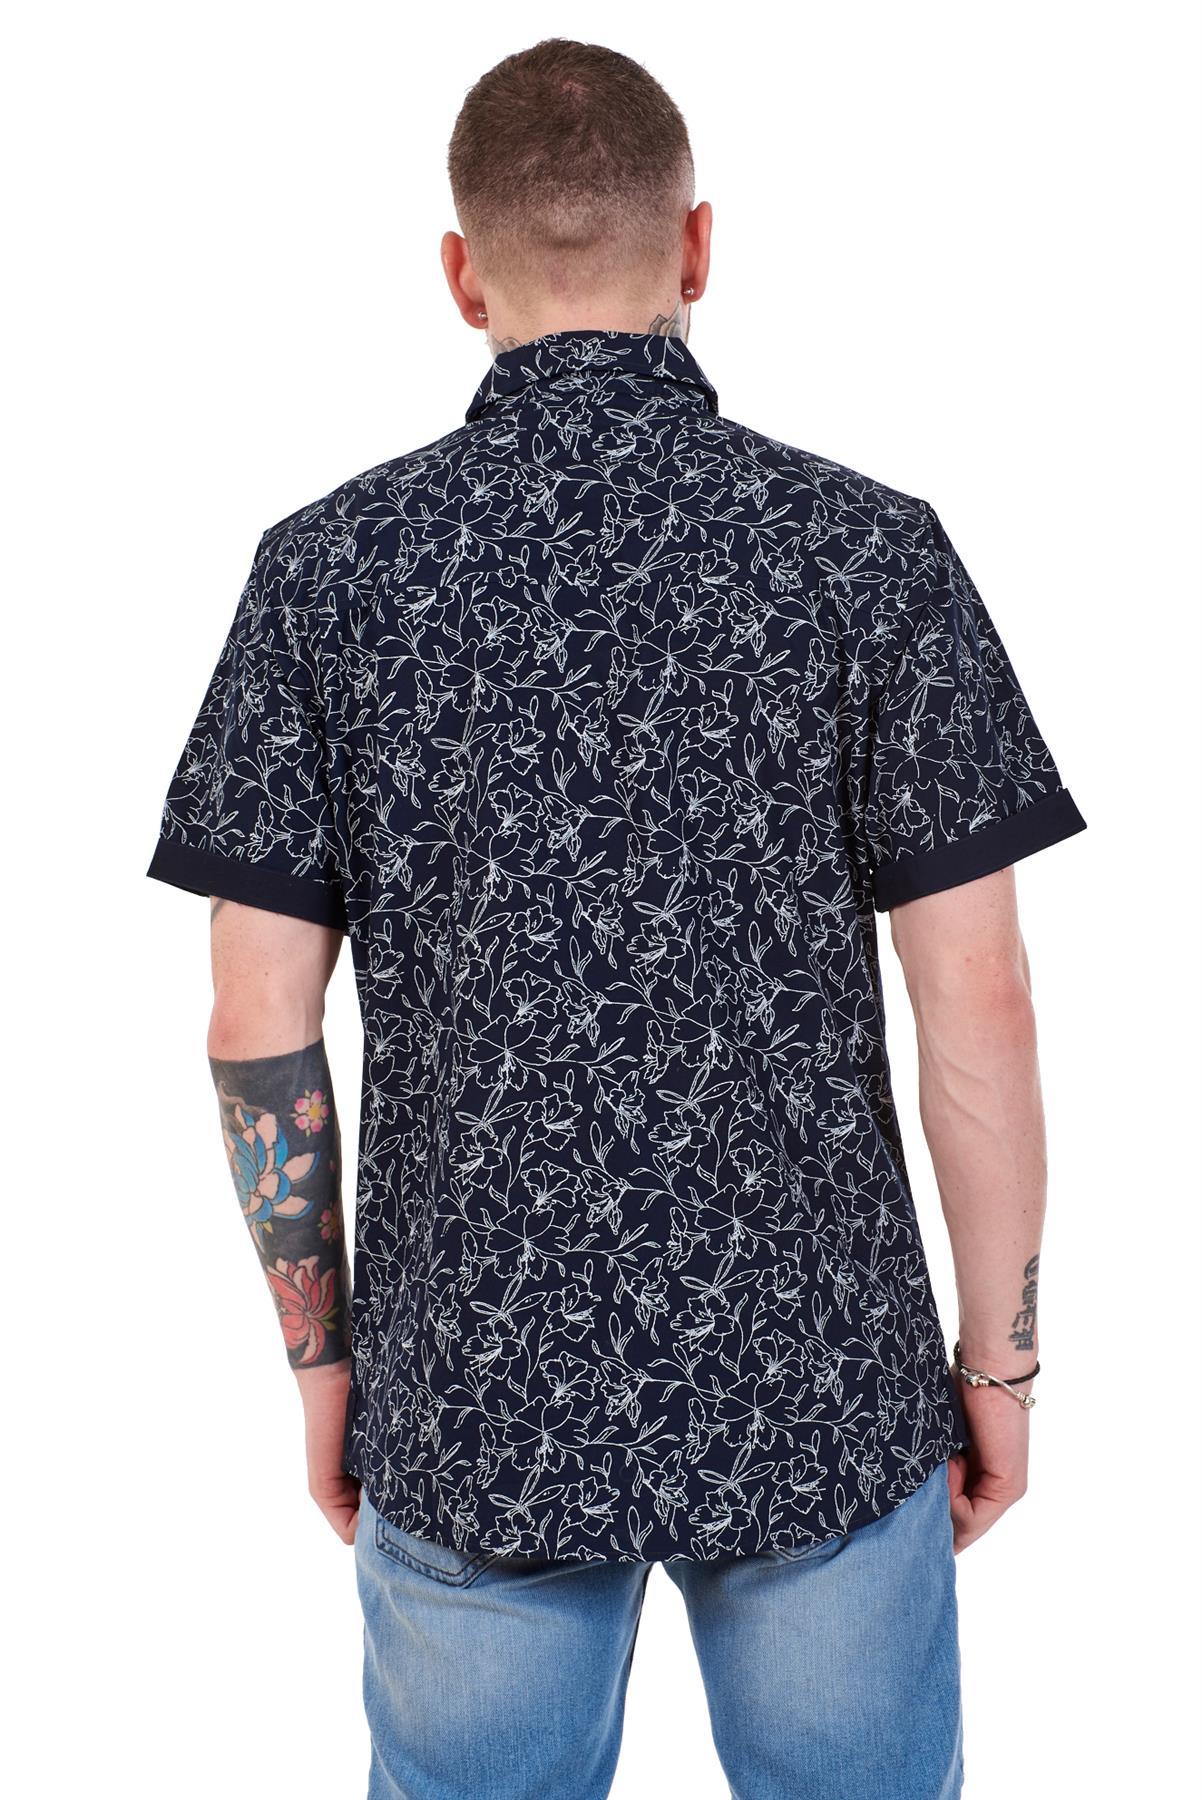 Mens-100-Cotton-Printed-Shirt-Short-Sleeve-Regular-Big-Size-Casual-Top-M-to-5XL thumbnail 15